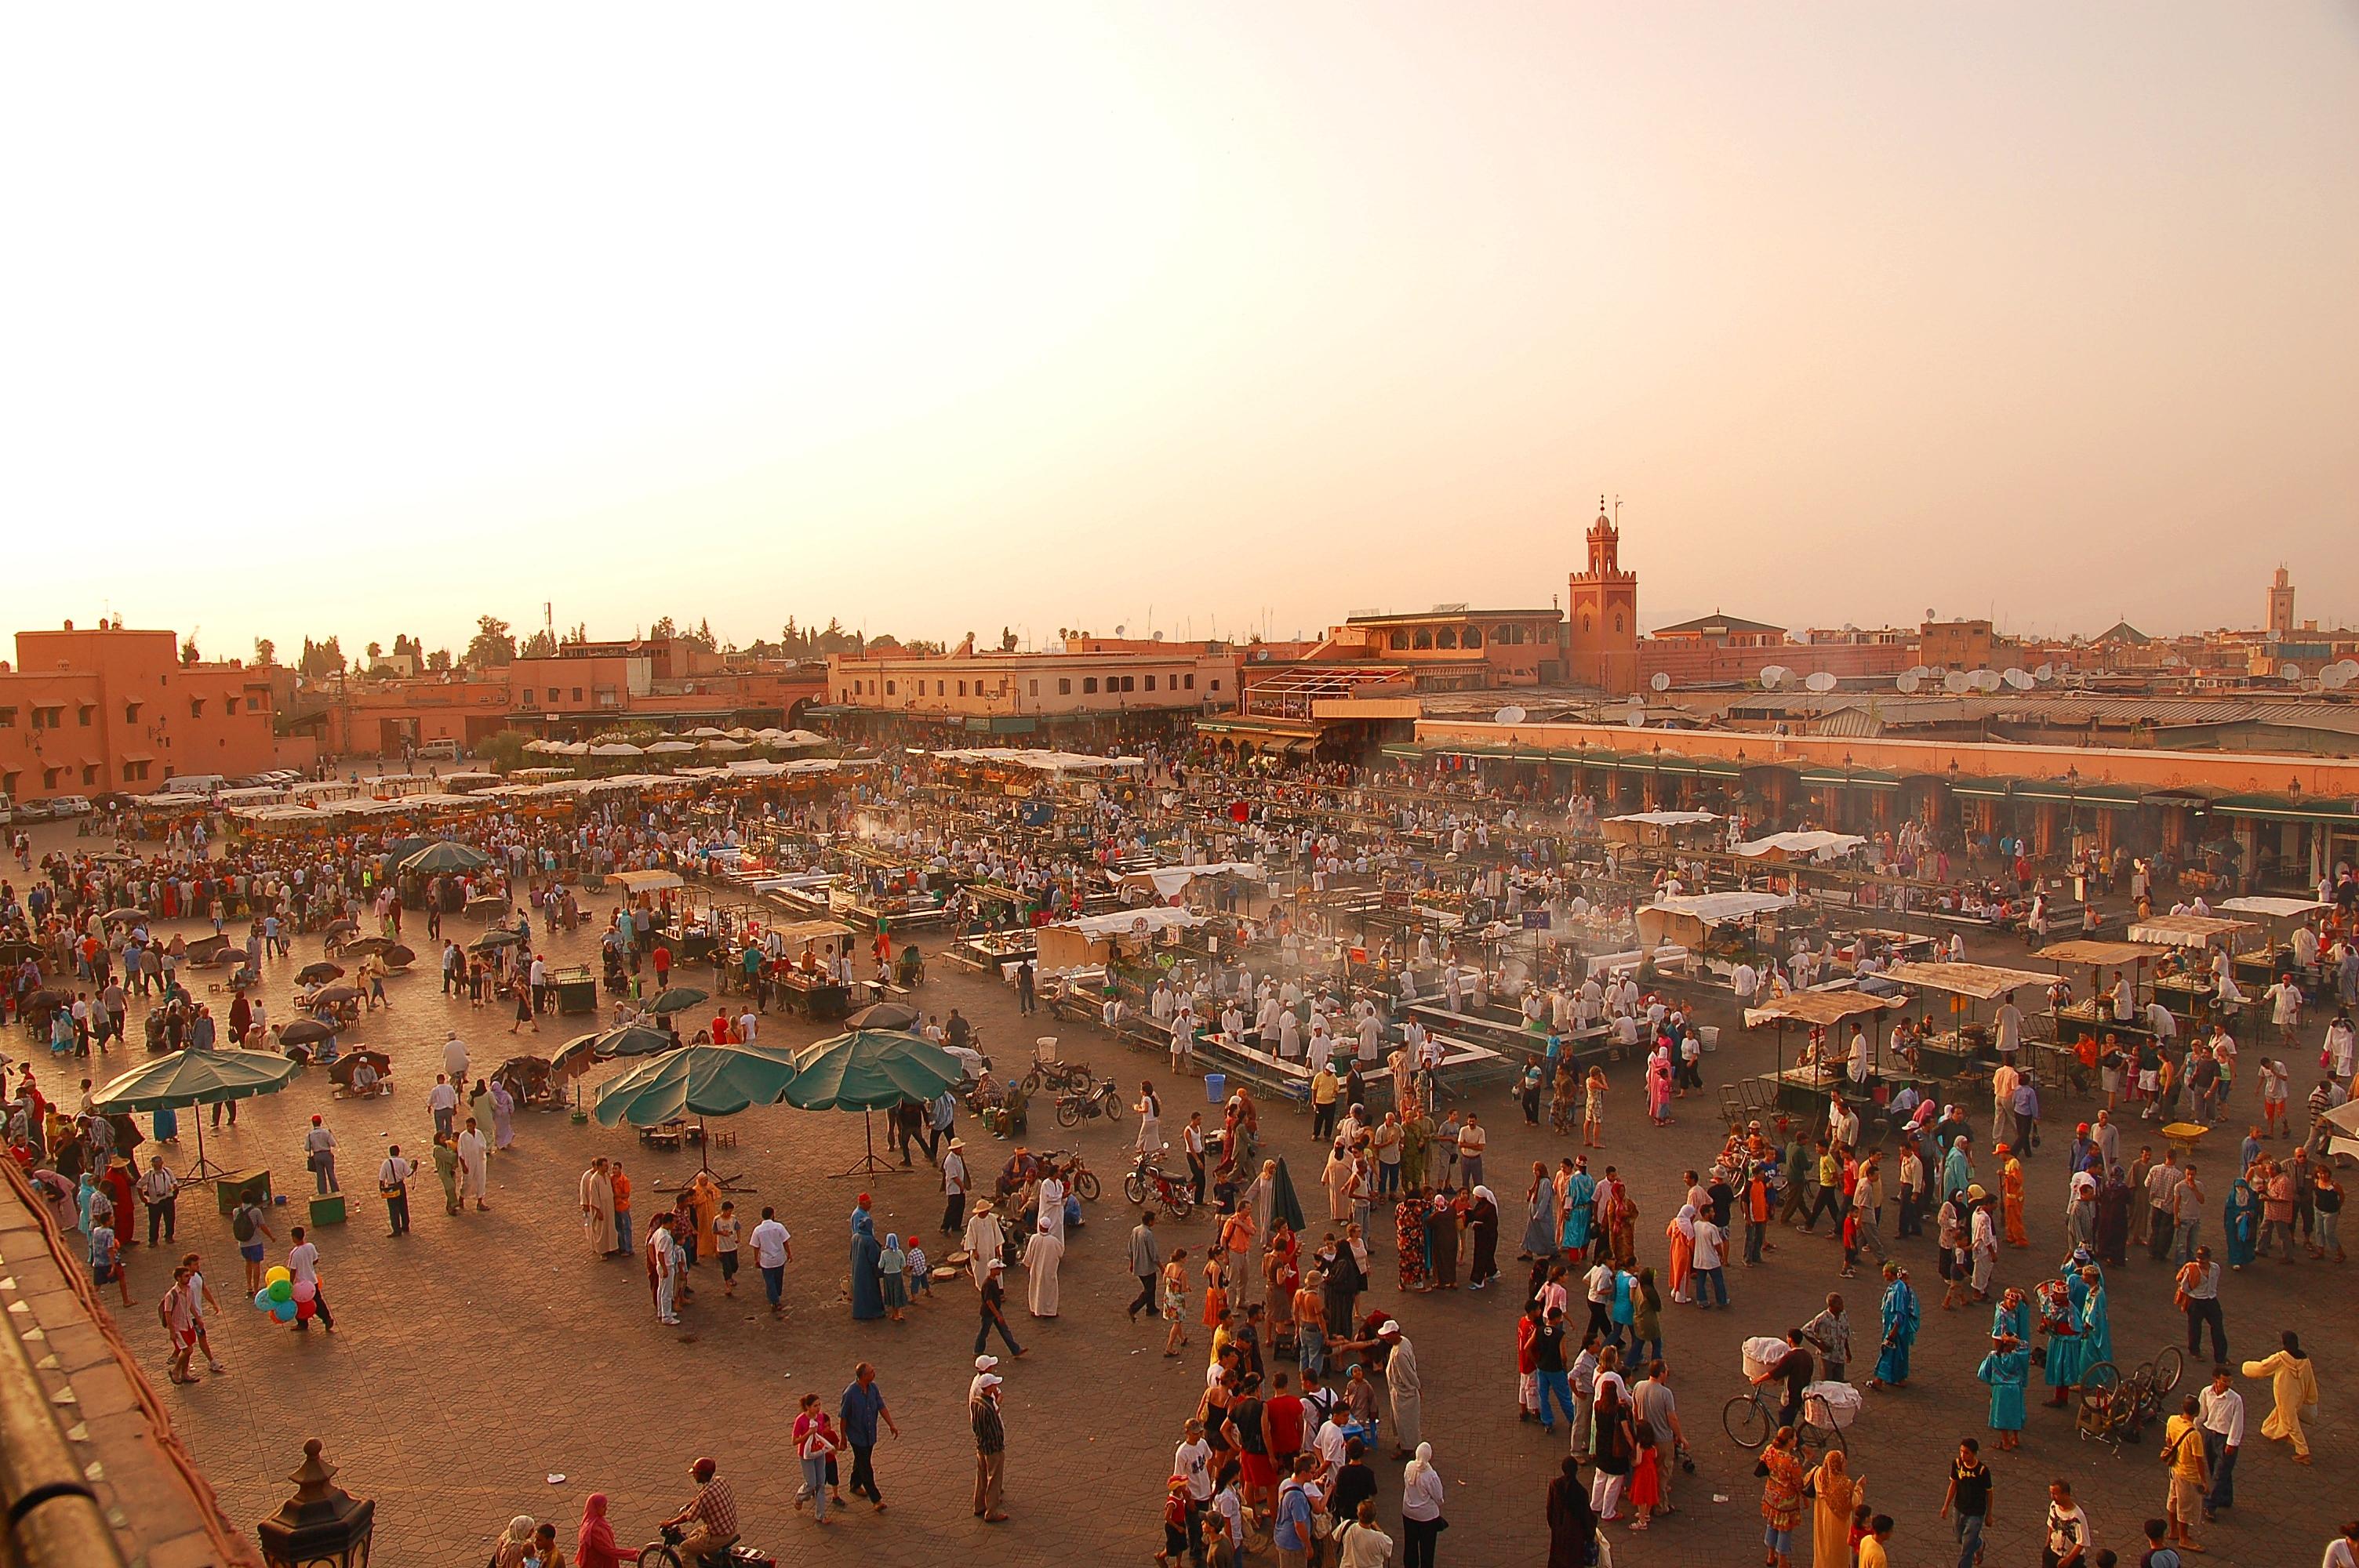 File:Maroc Marrakech Jemaa-el-Fna Luc Viatour.JPG - Wikimedia Commons